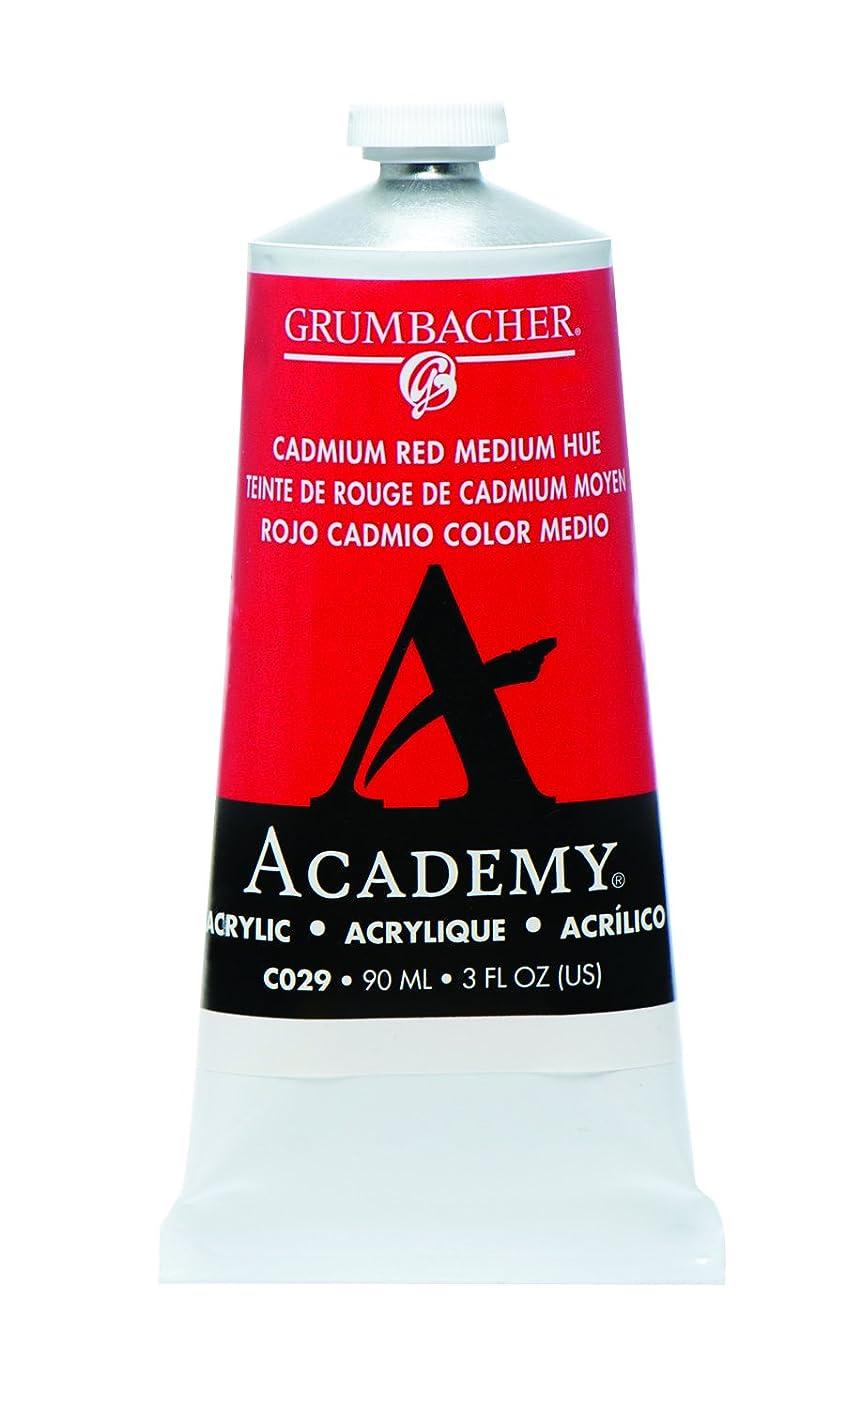 Grumbacher Academy Acrylic Paint, 90ml/3 oz Metal Tube, Cadmium Red Medium Hue